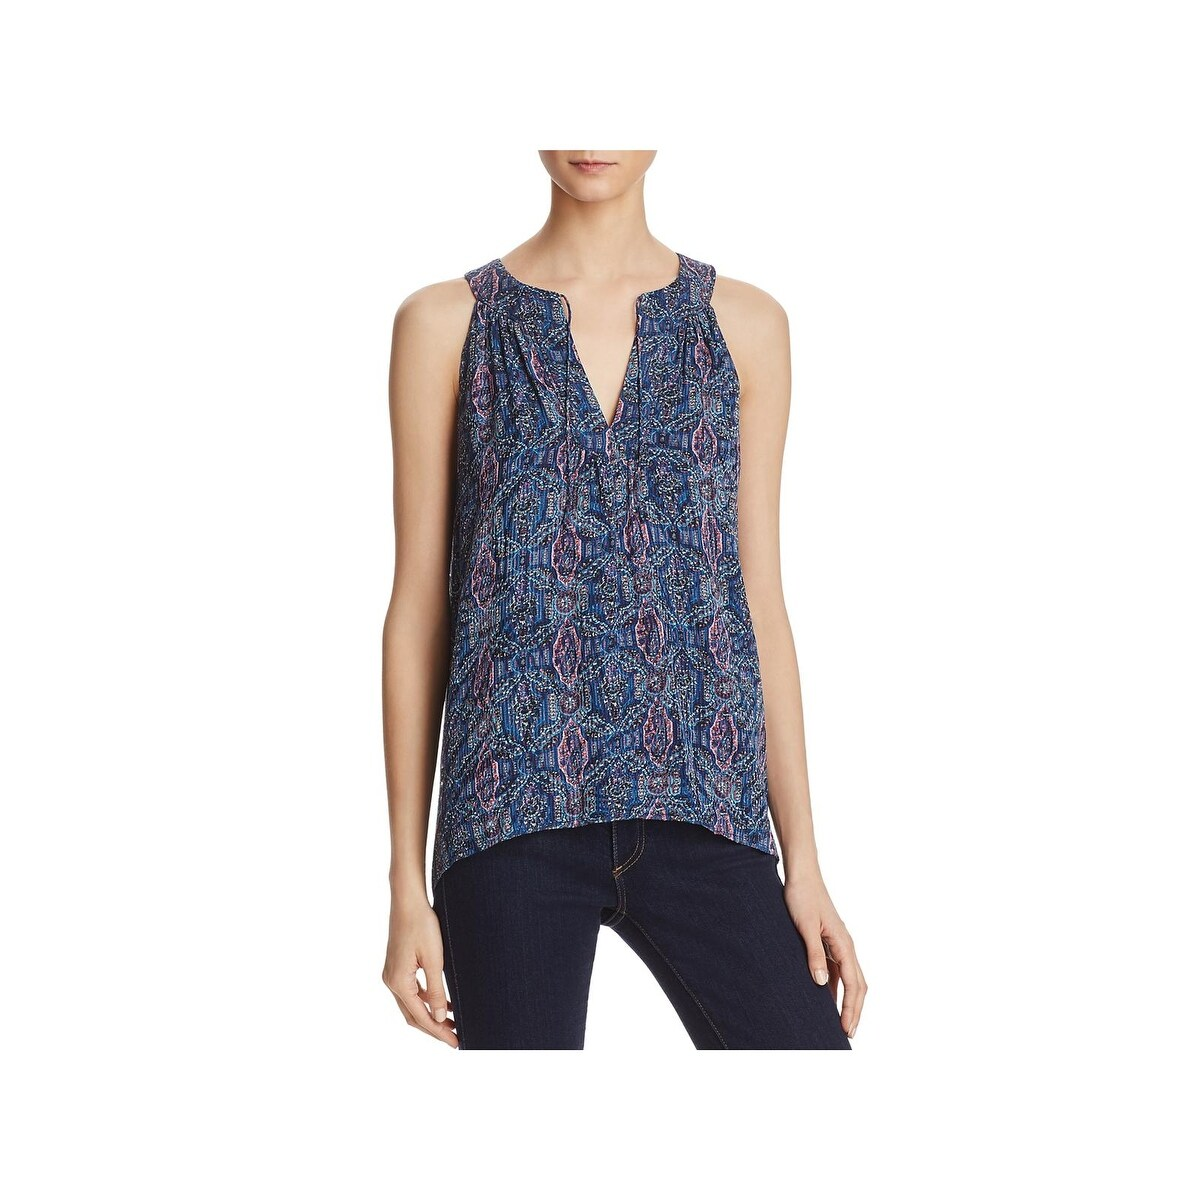 d0220eb7f8f955 Shop Joie Womens Elin Pullover Top Silk Sleeveless - XS - Free ...